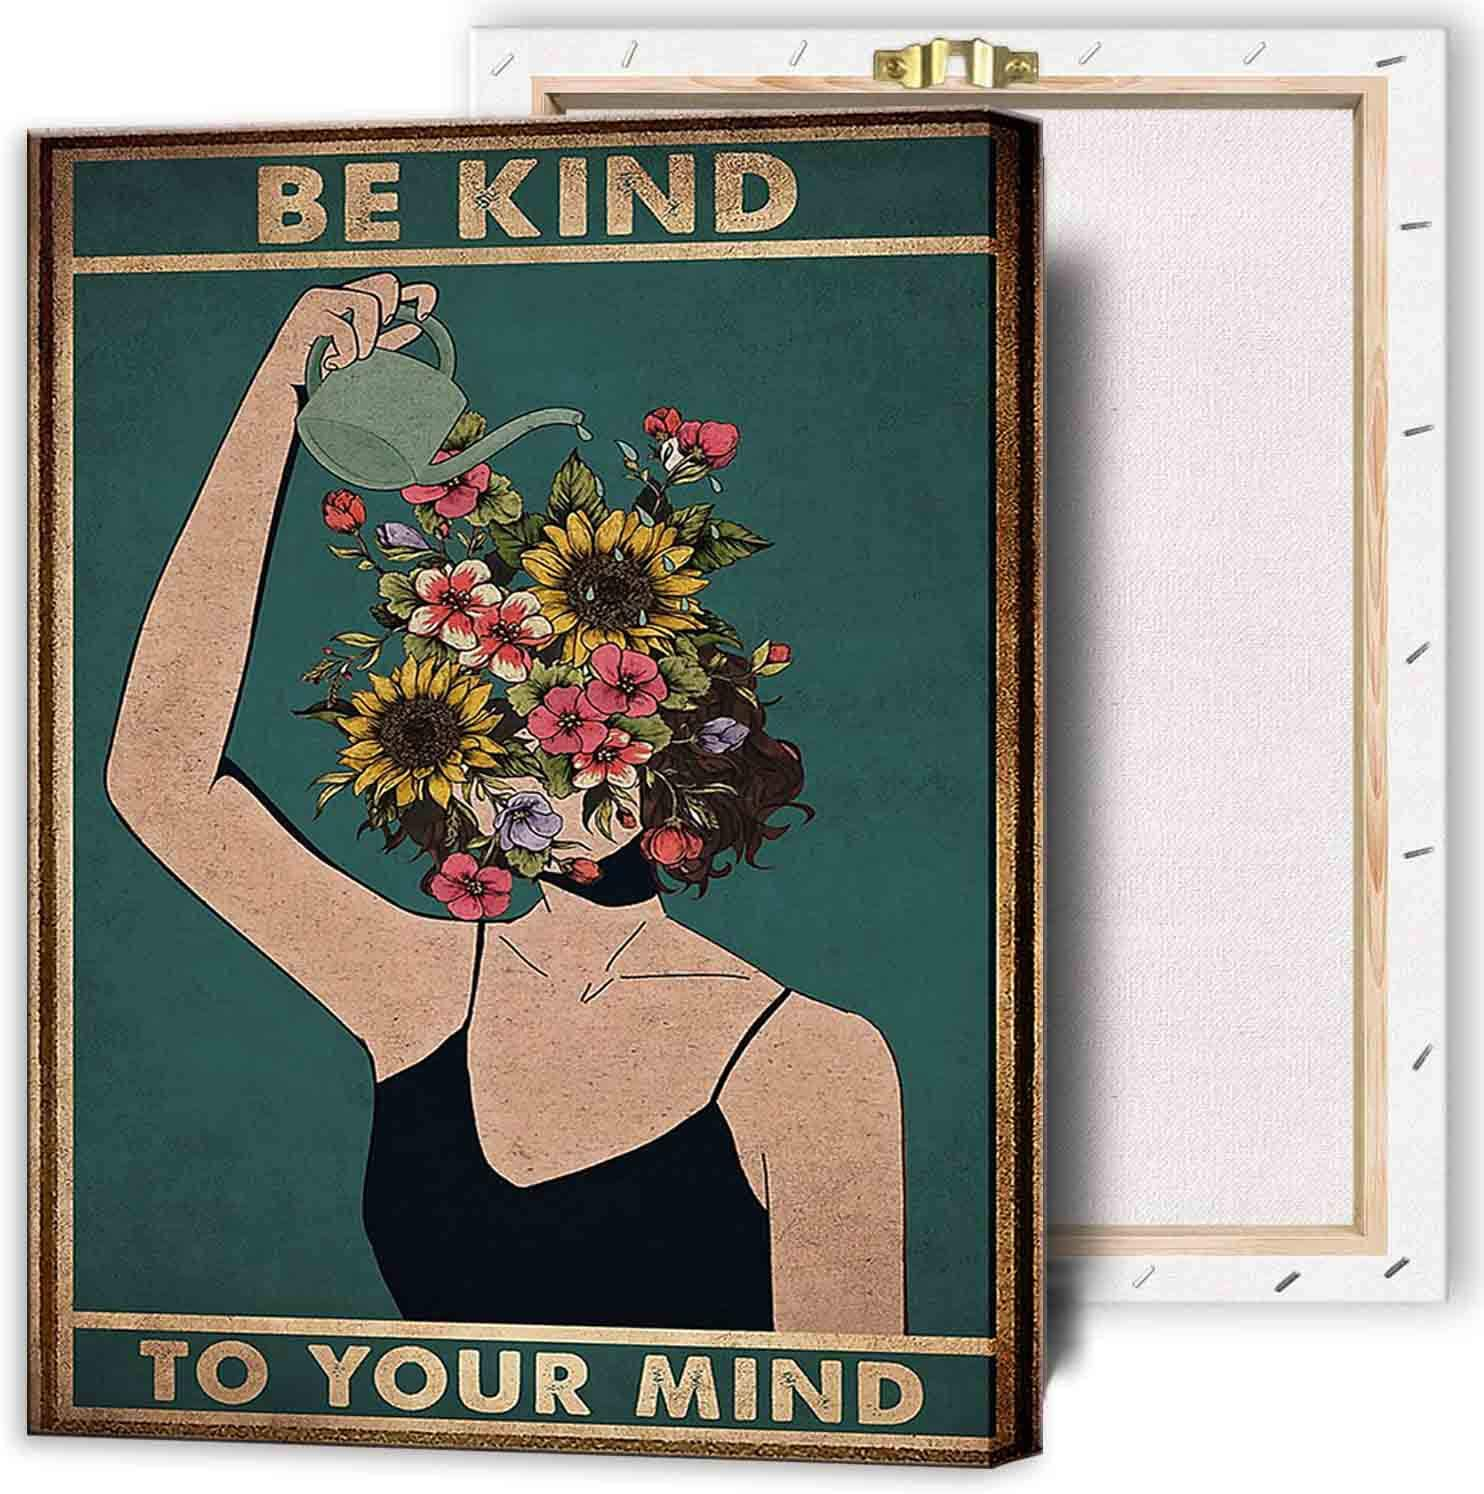 IXMAH Popular standard Super intense SALE - Be Kind To Your Mind Women Poster Wall Canvas Art Print